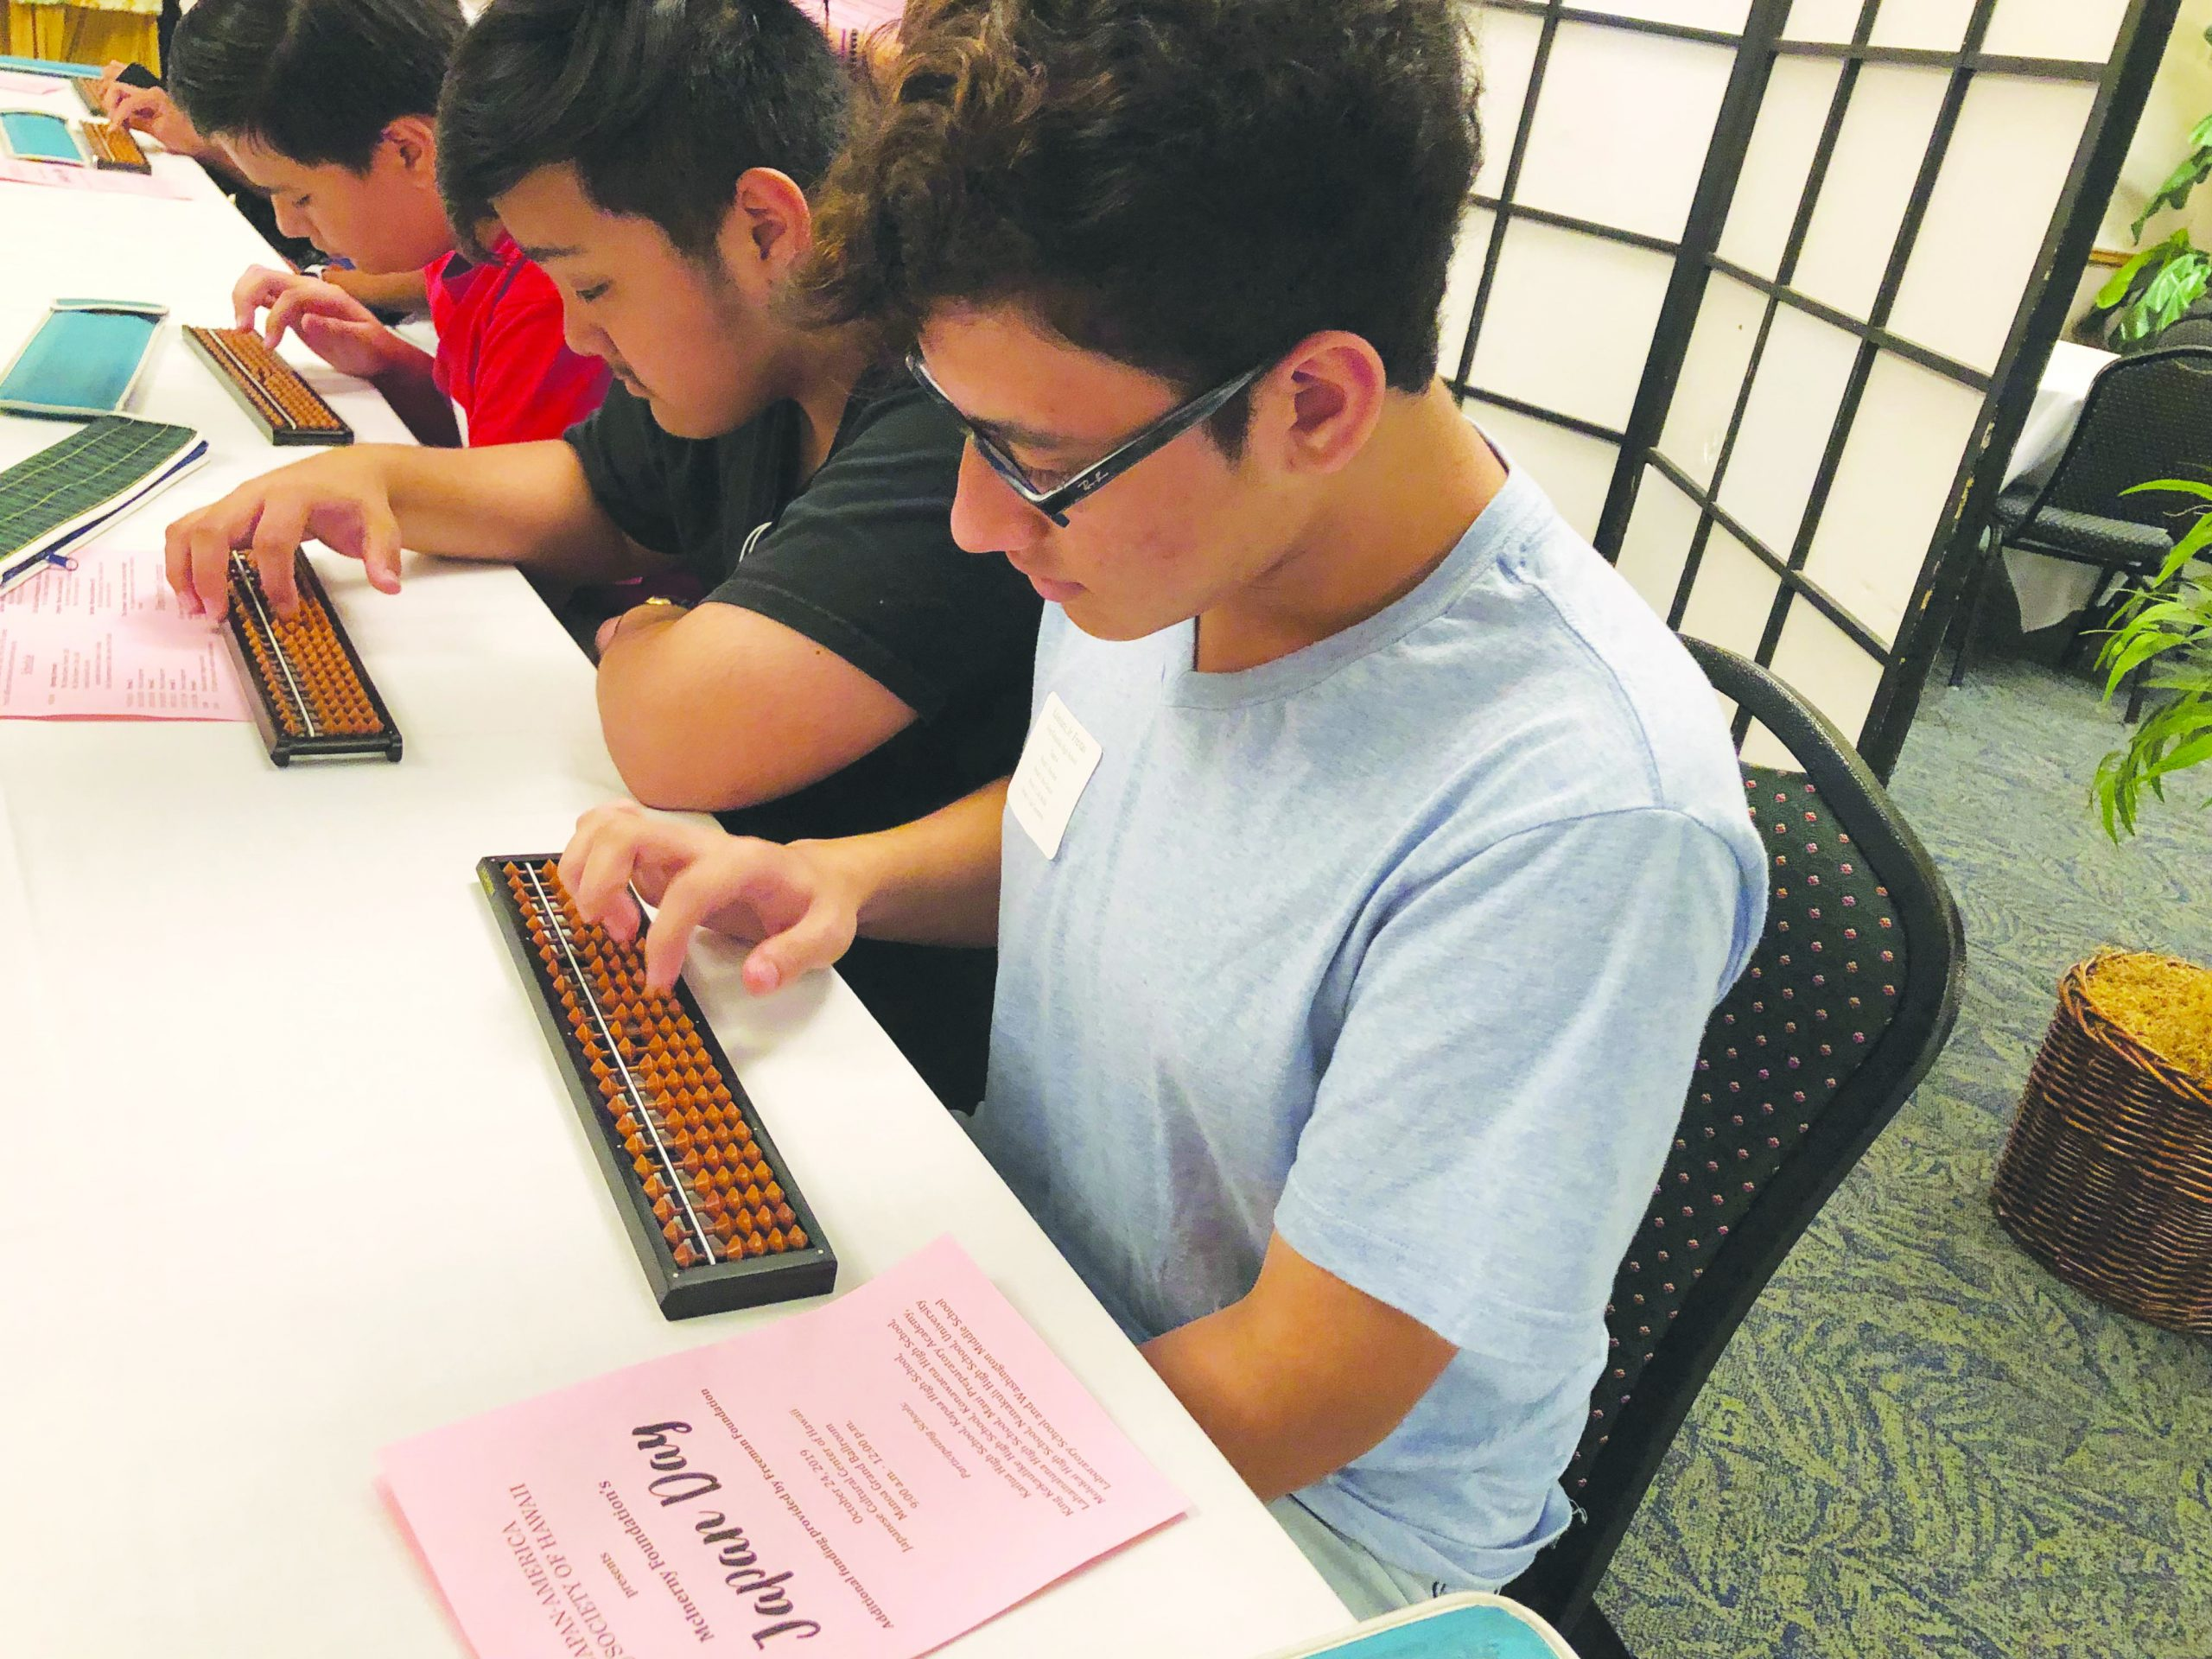 Kaleolani Freitas Jr. from King Kekaulike High School in Kula, Maui, practices calculating various math problems on the soroban, or Japanese abacus.